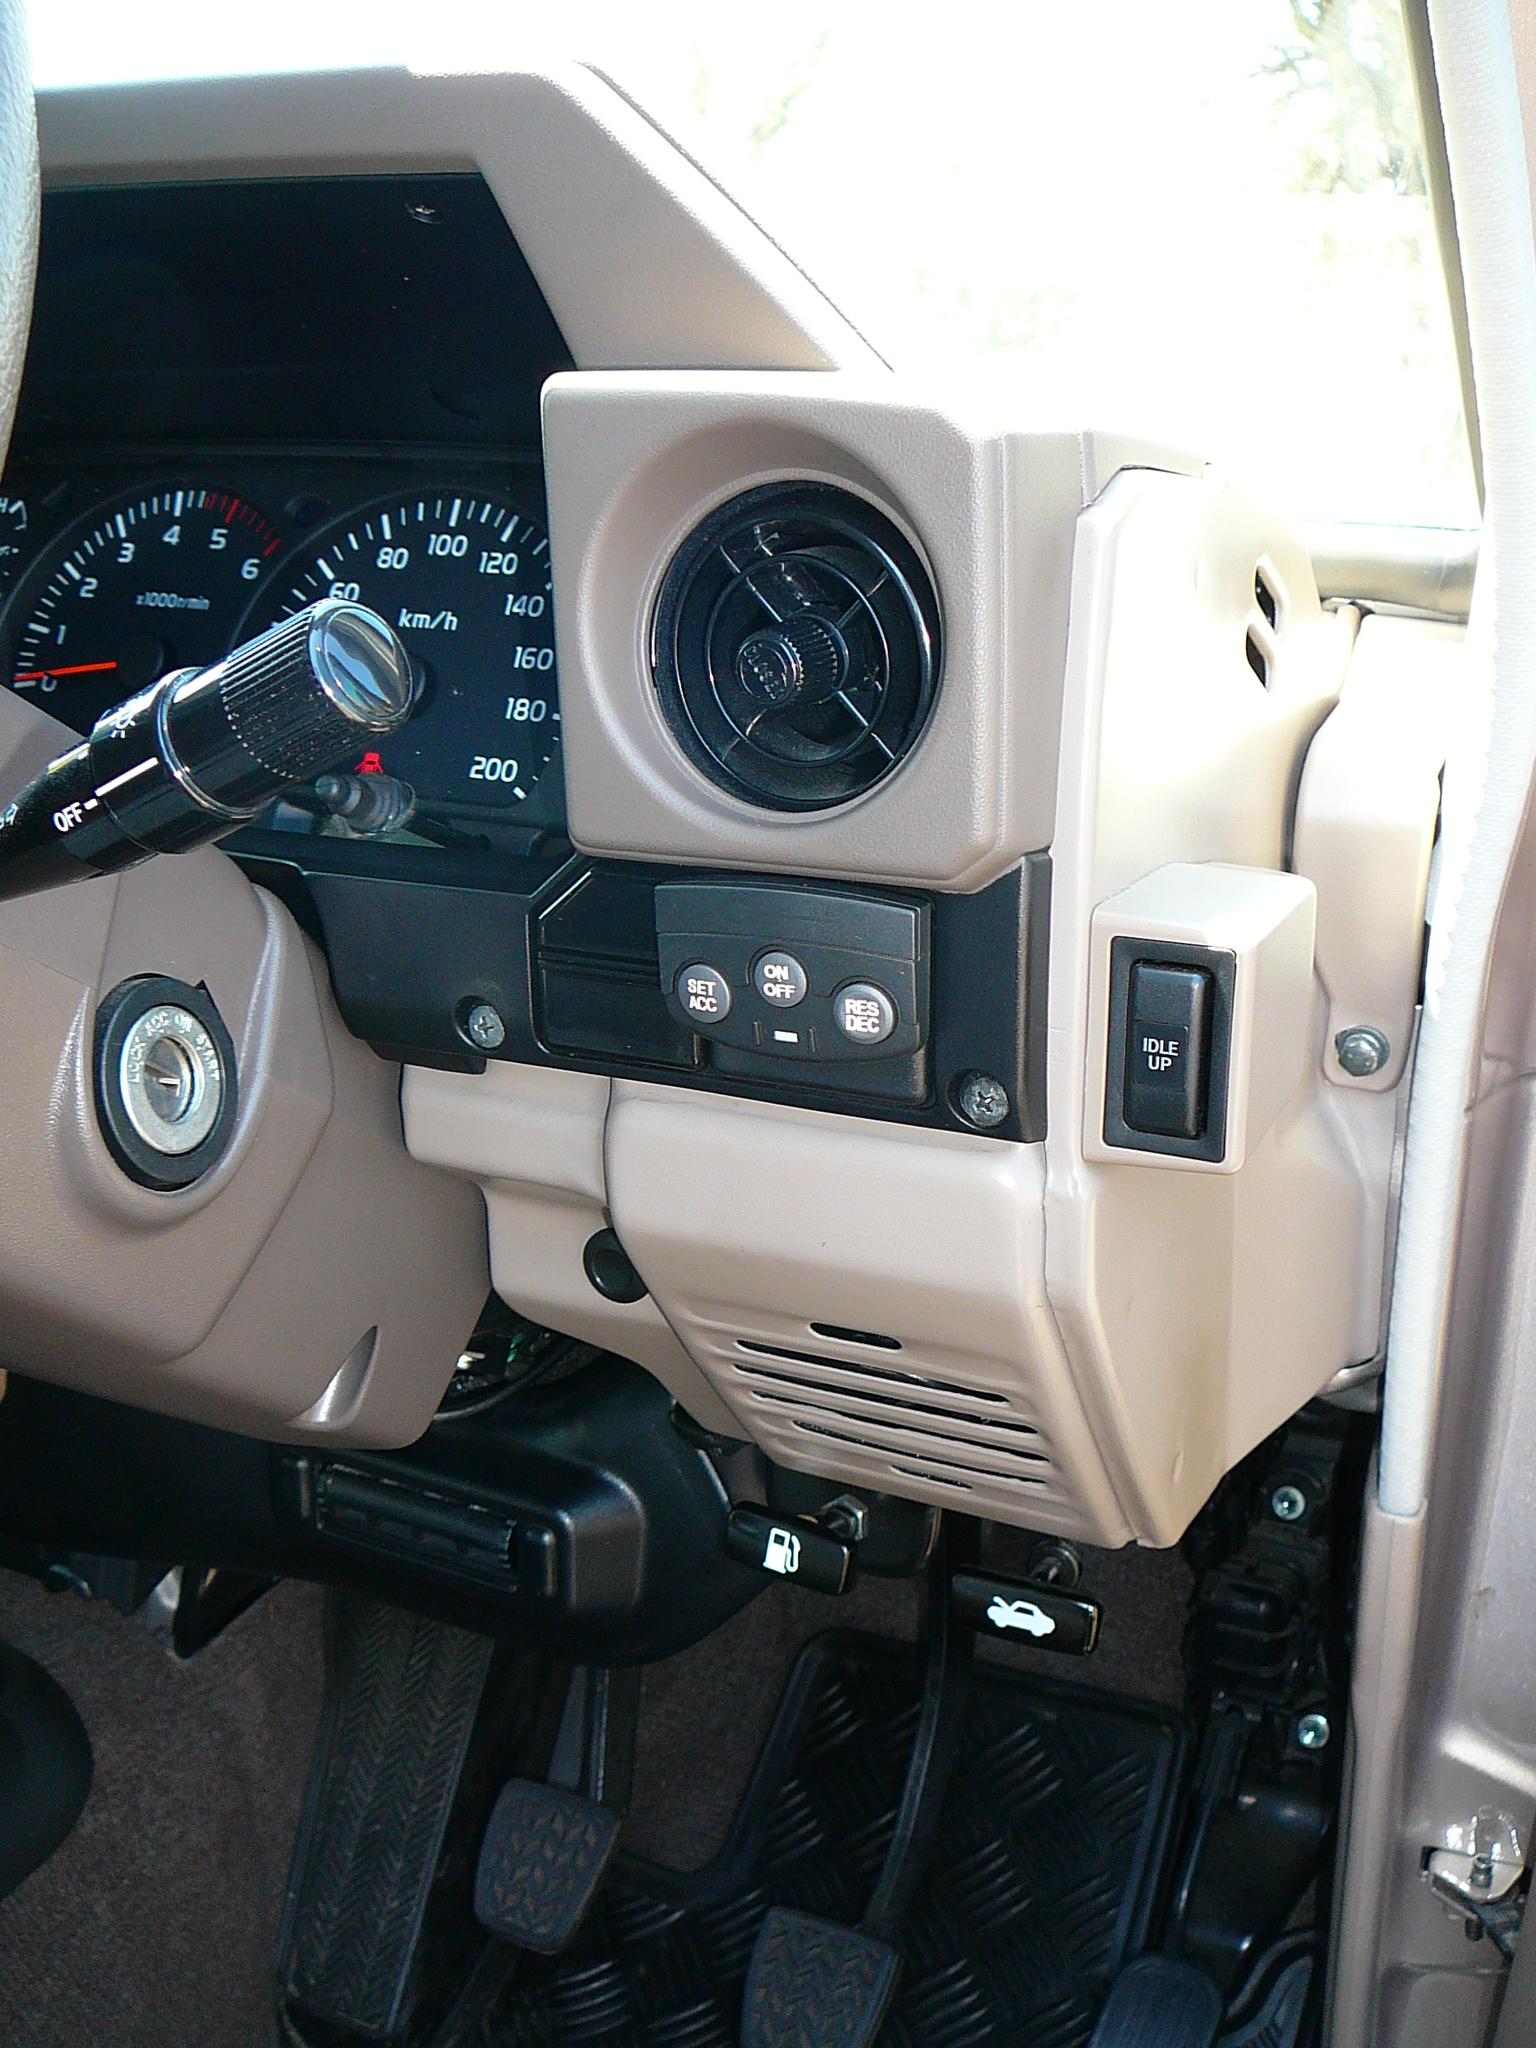 Brake Controller Installation >> Toyota Landcruiser 70 Series, Pad mount Cruise Control ...